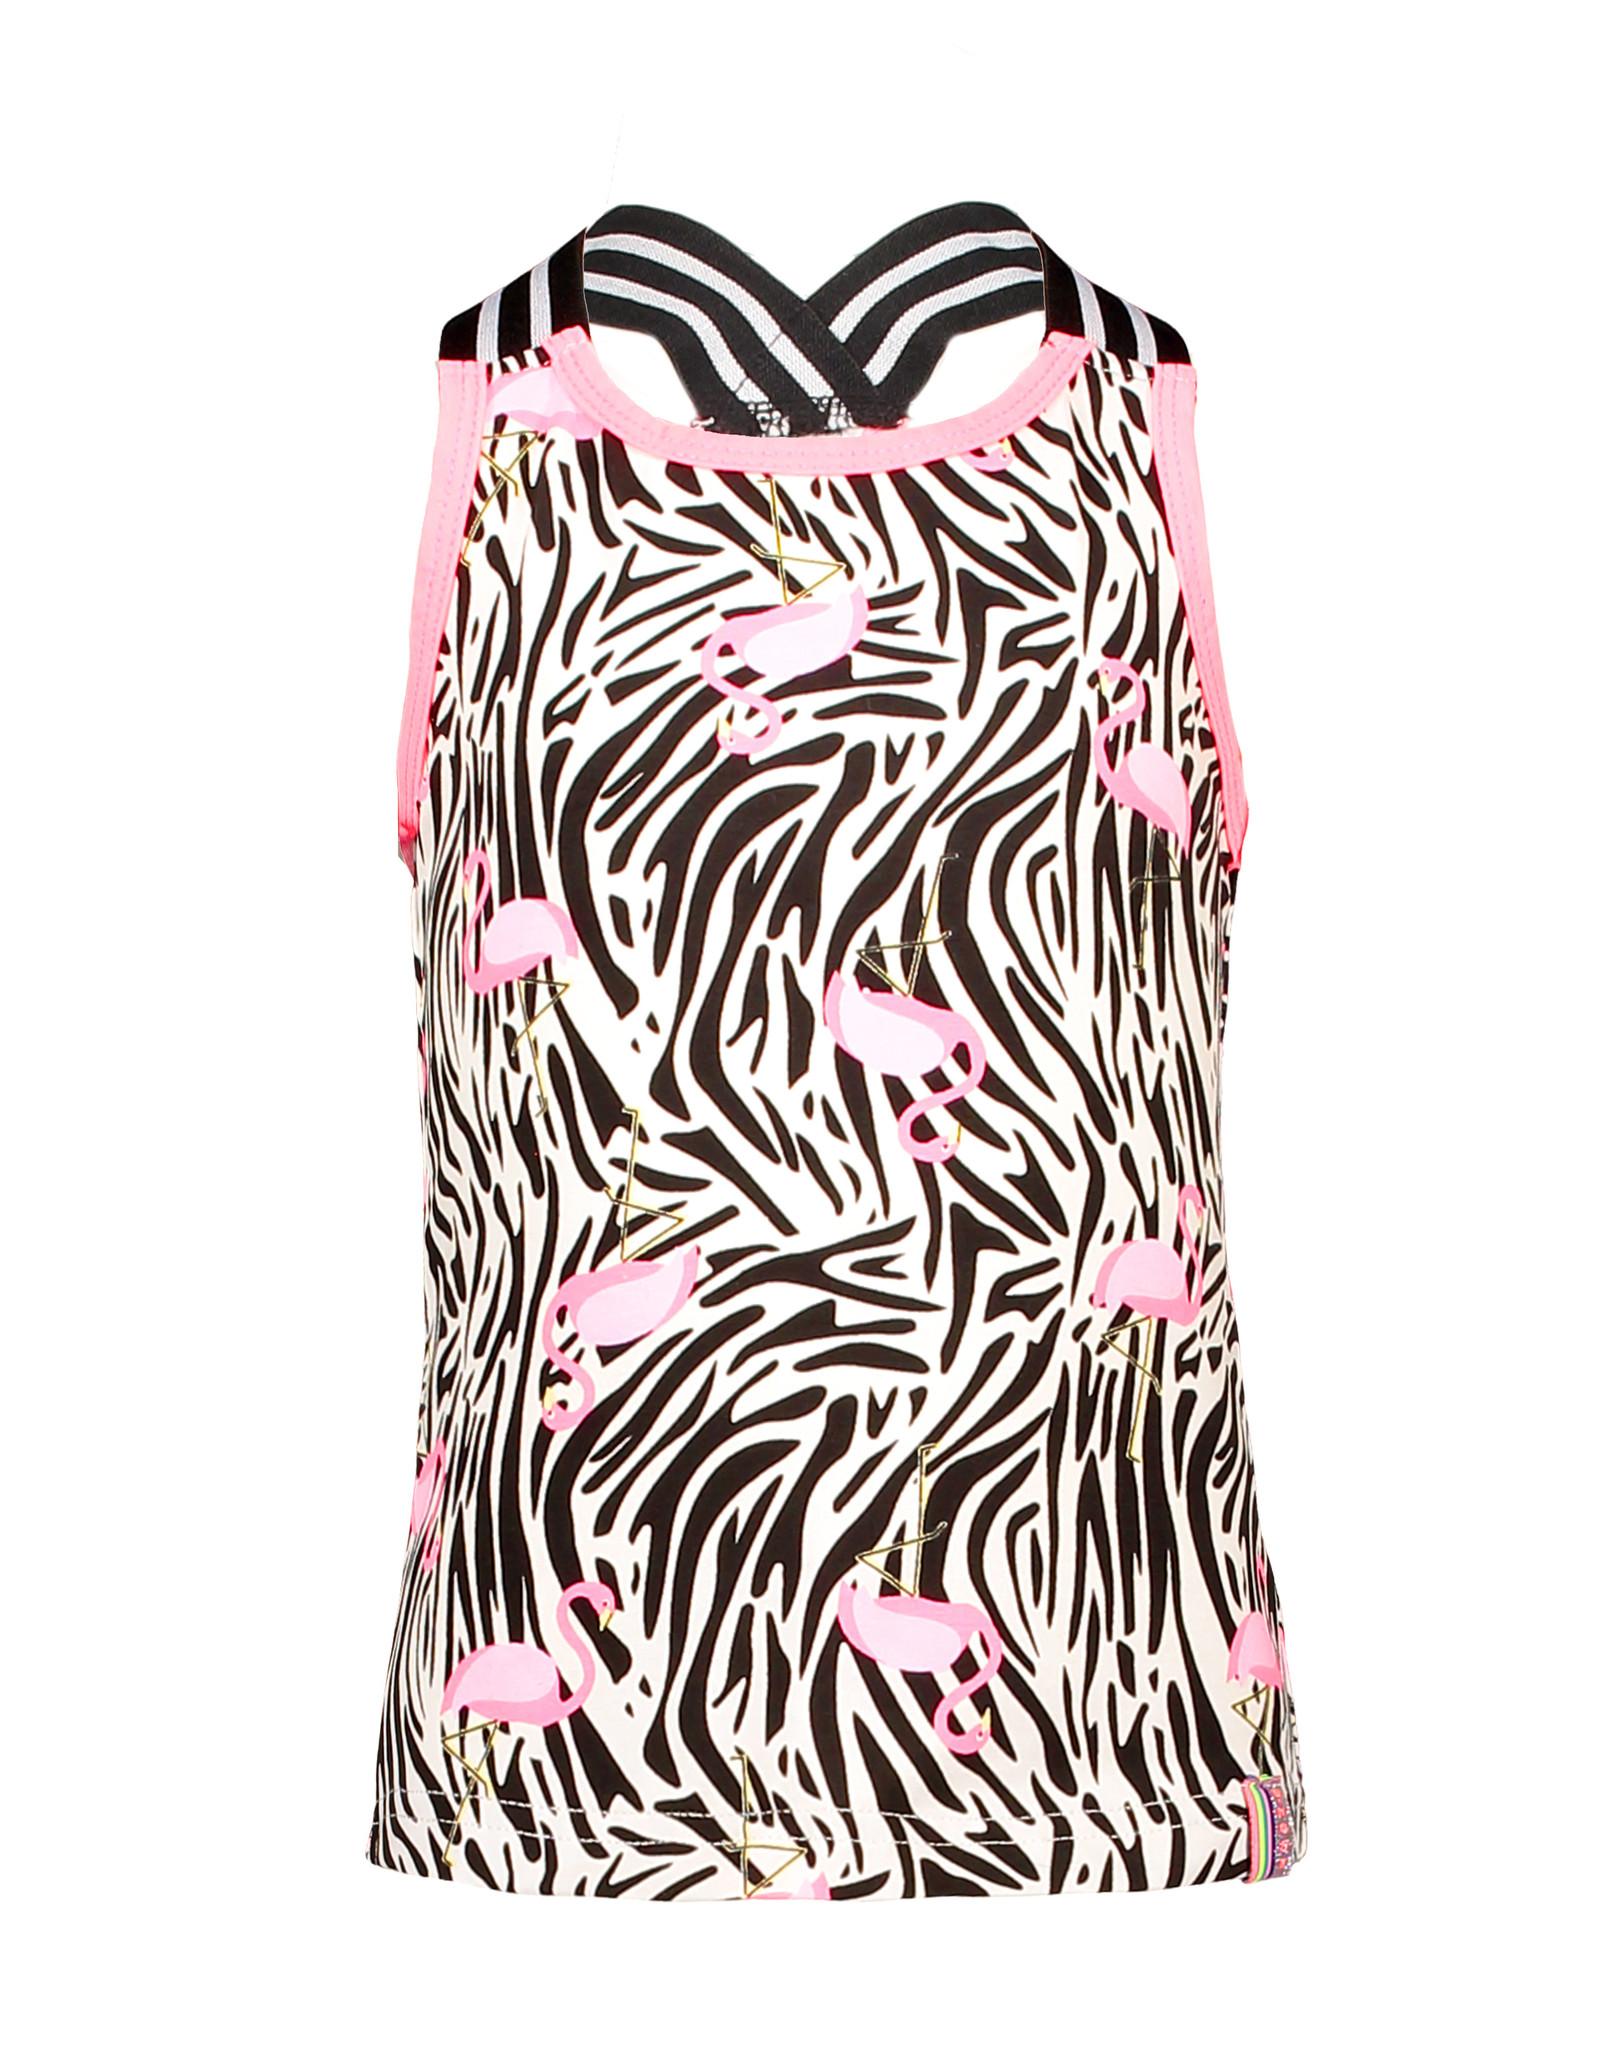 B.Nosy B.Nosy Girls Jersey Singlet With Elastic- White Flamingo Zebra All Over Print